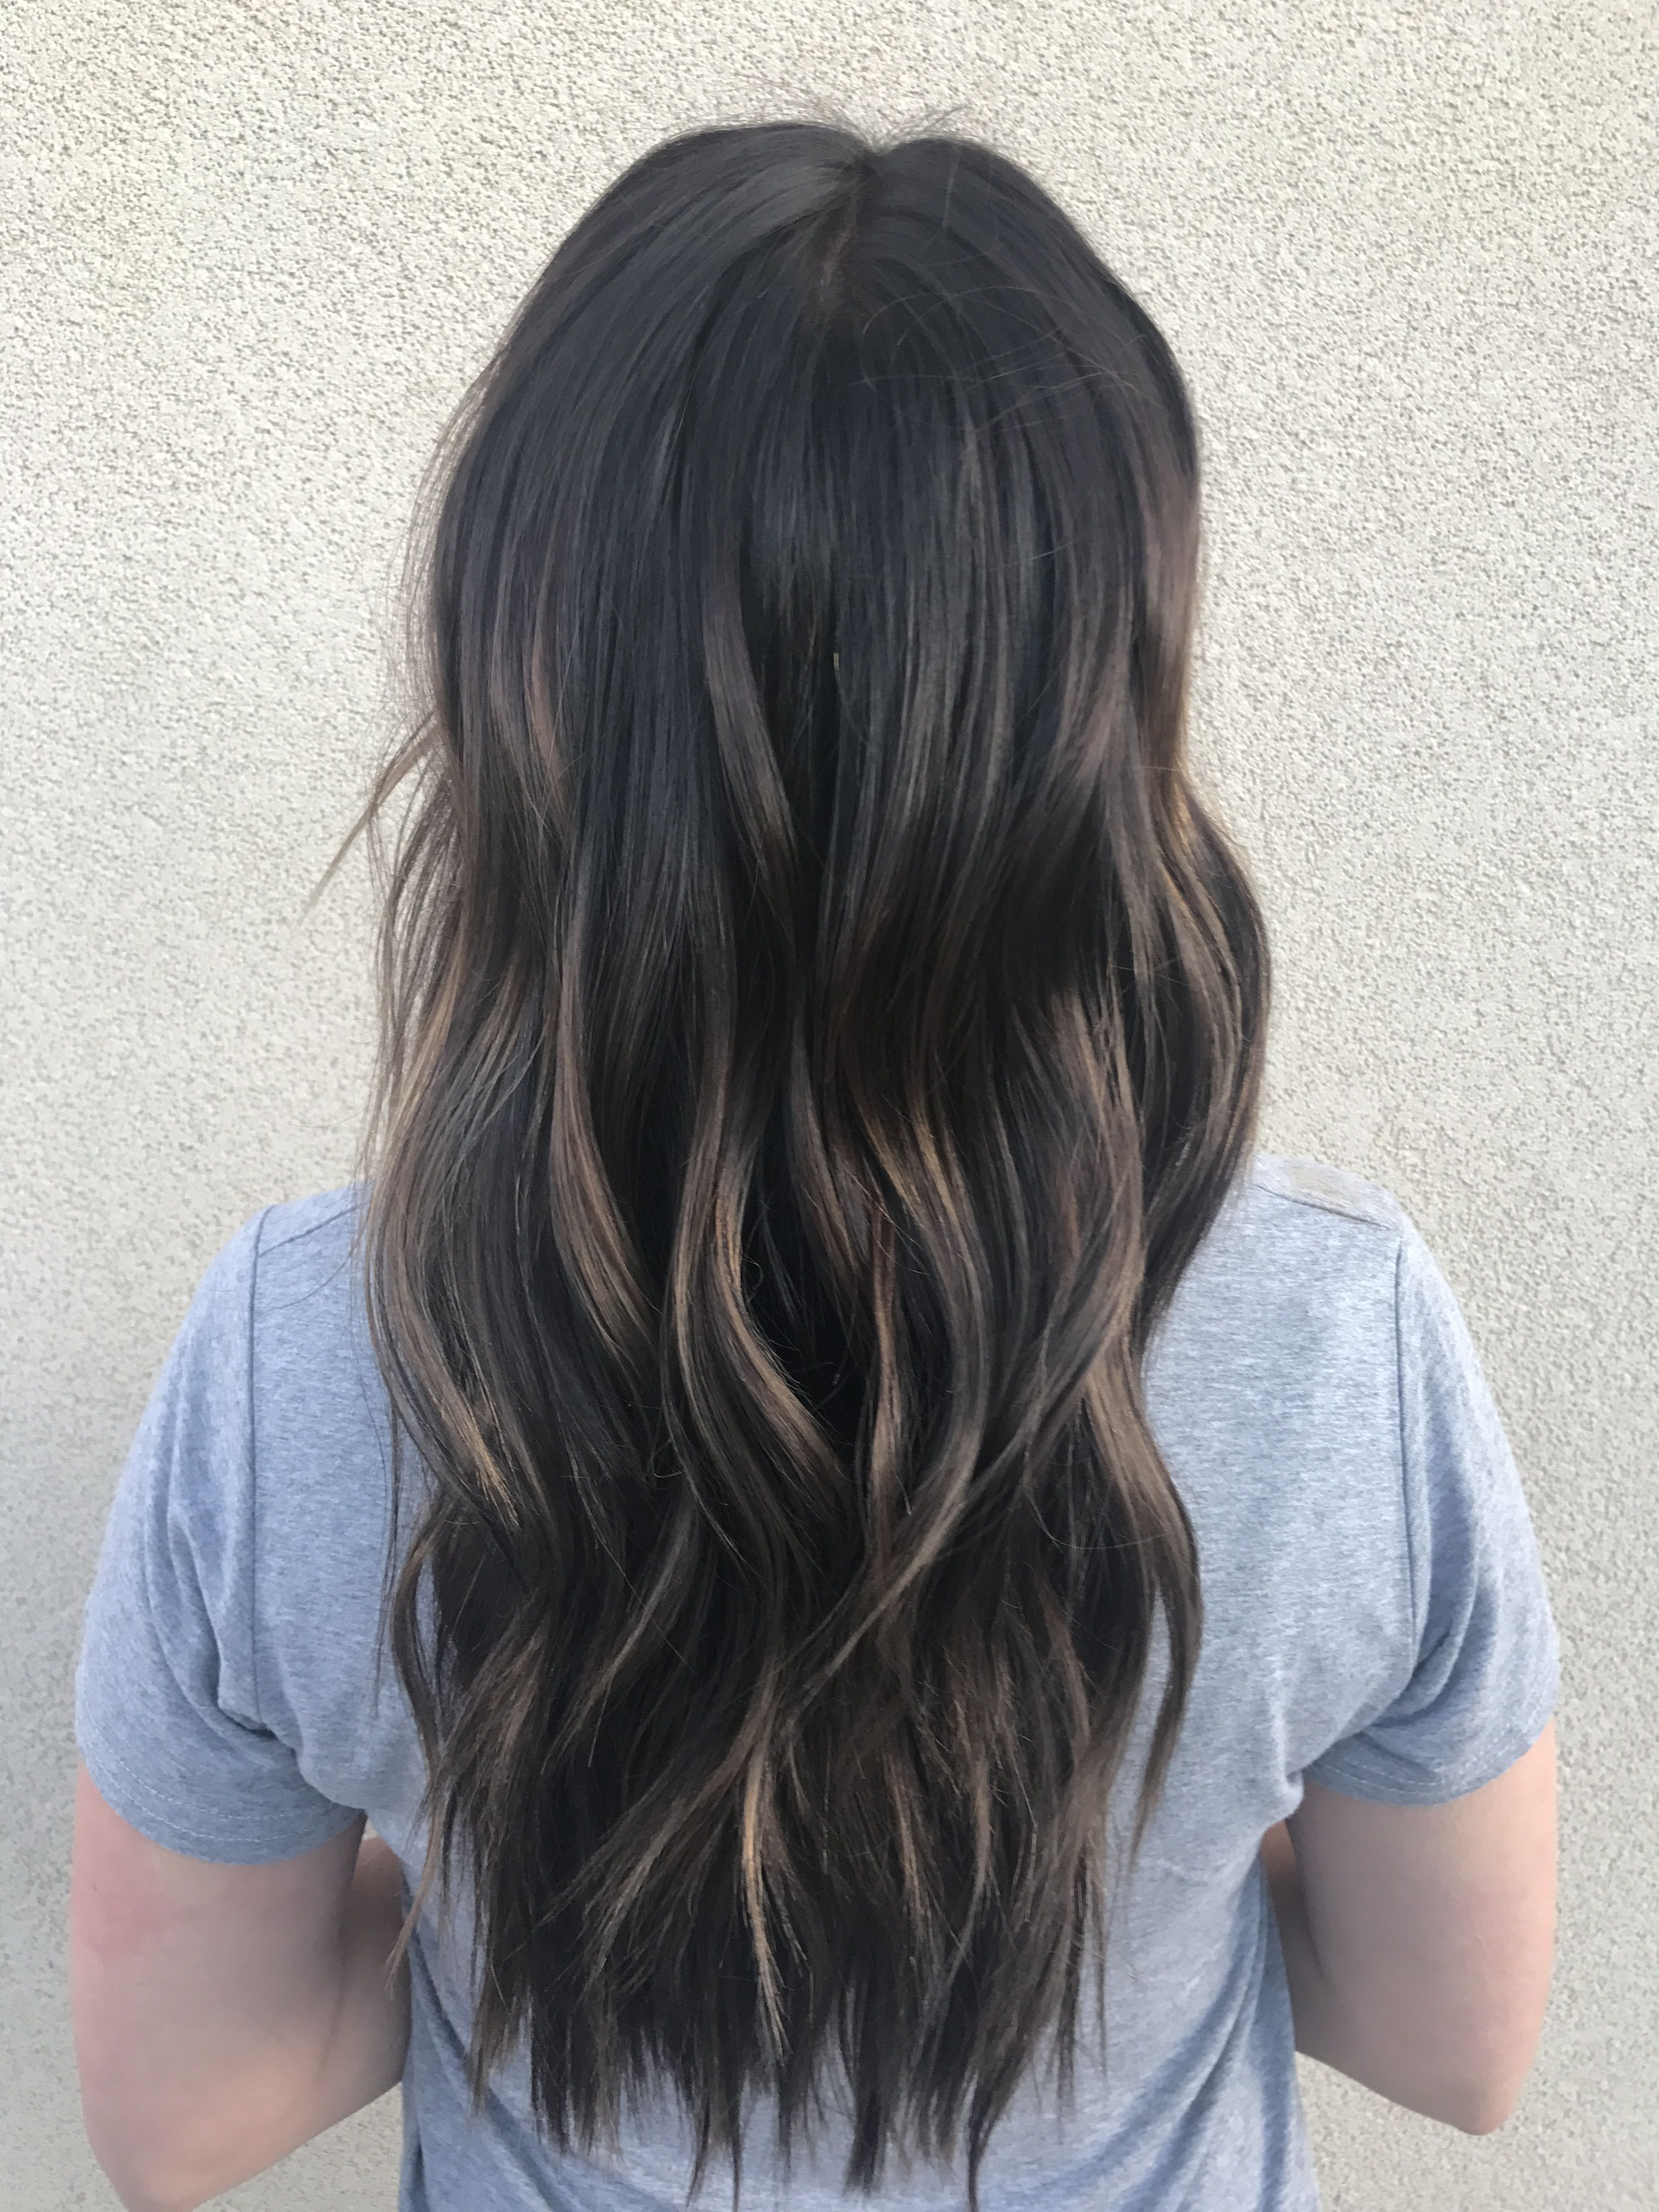 Pin by Crystal Warren on Hair Styles I like | Hair, Hair ...